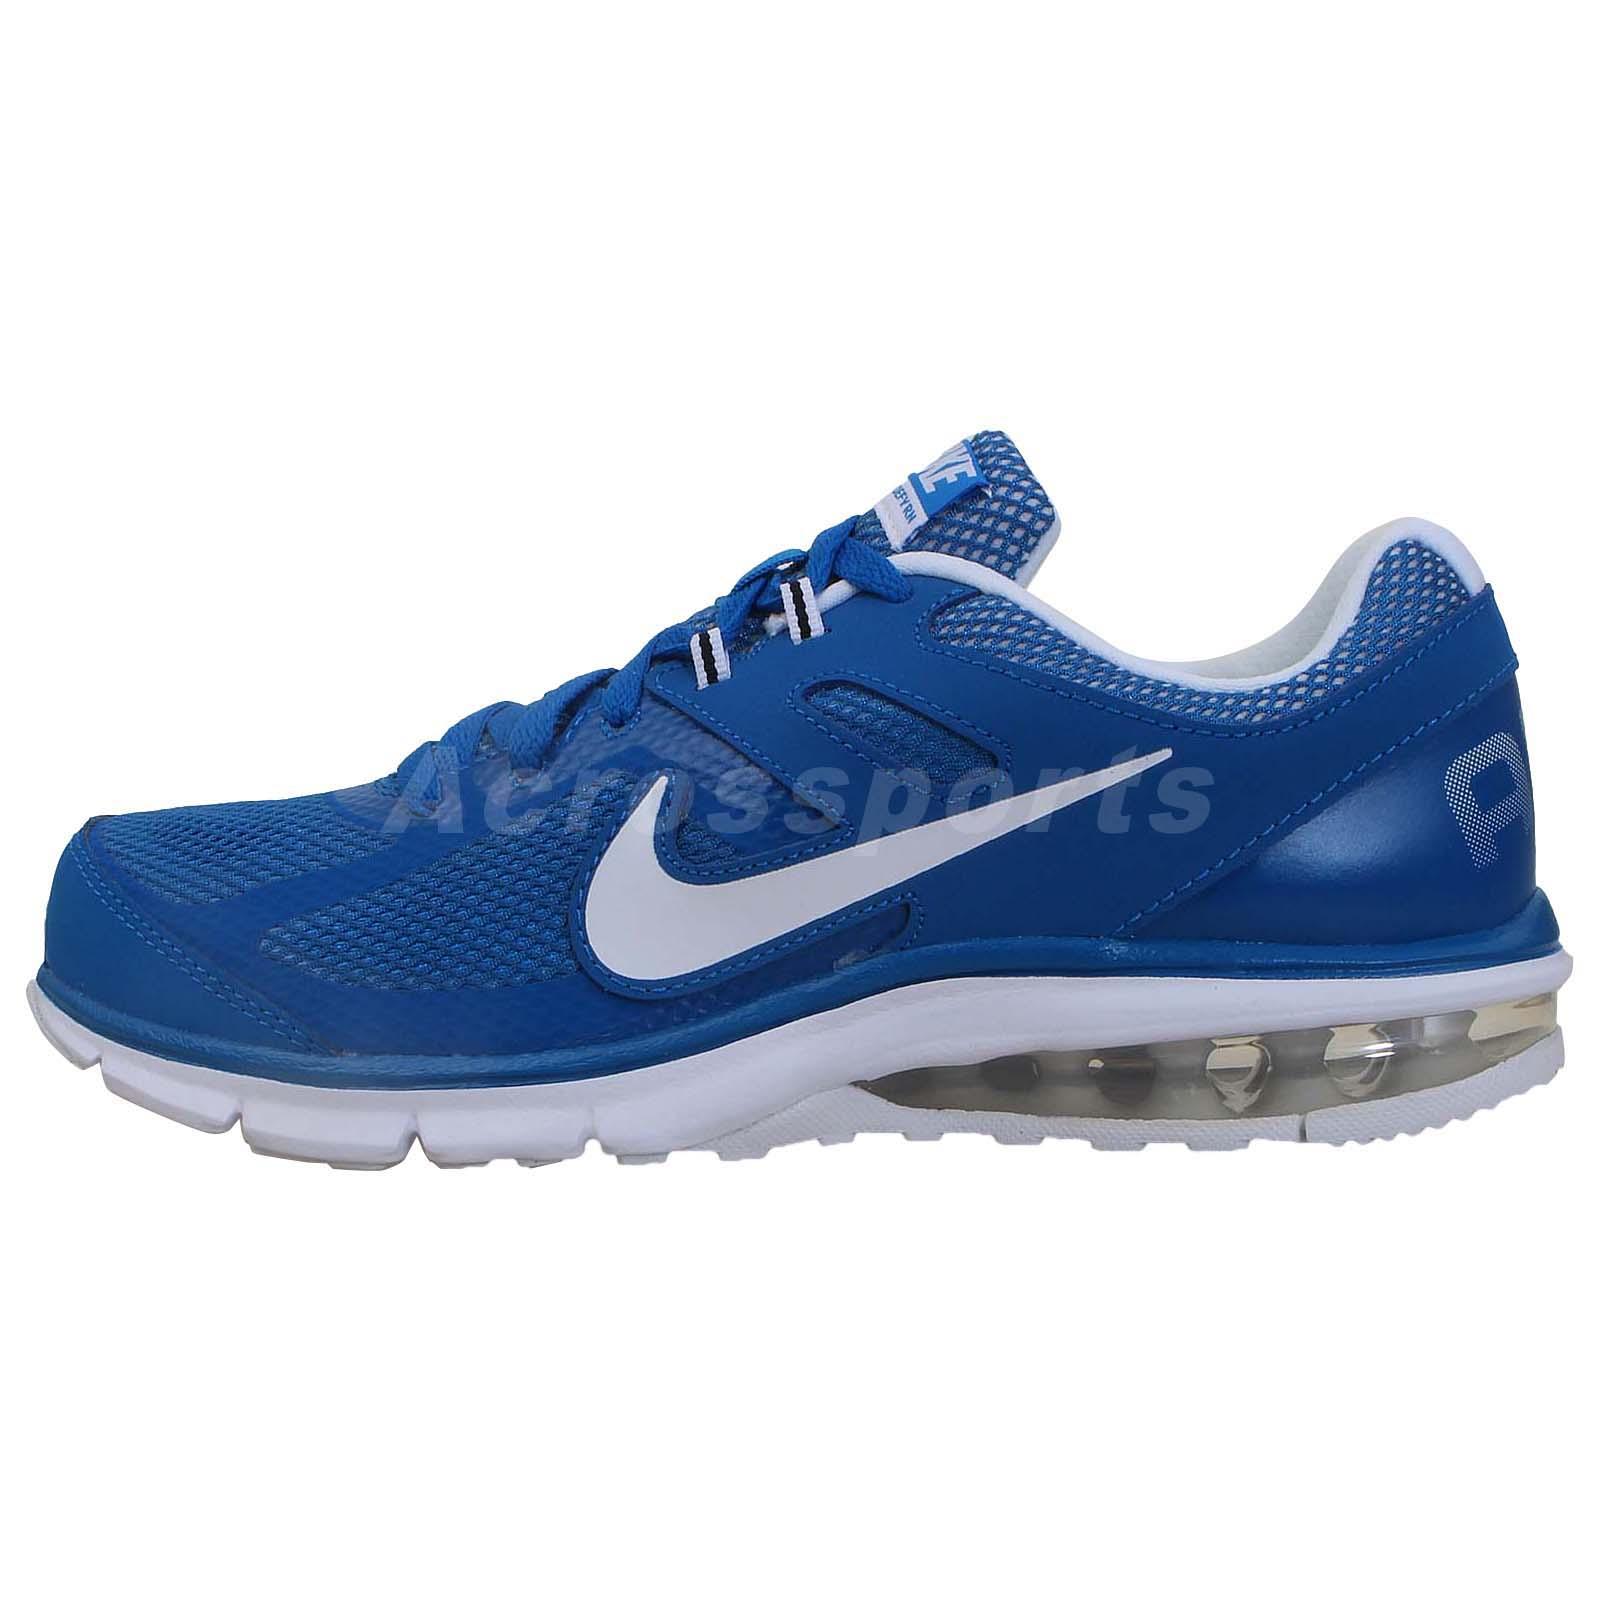 Fit Sole Nike Free Cheap Ol School And Jordans  56fa216e6d2